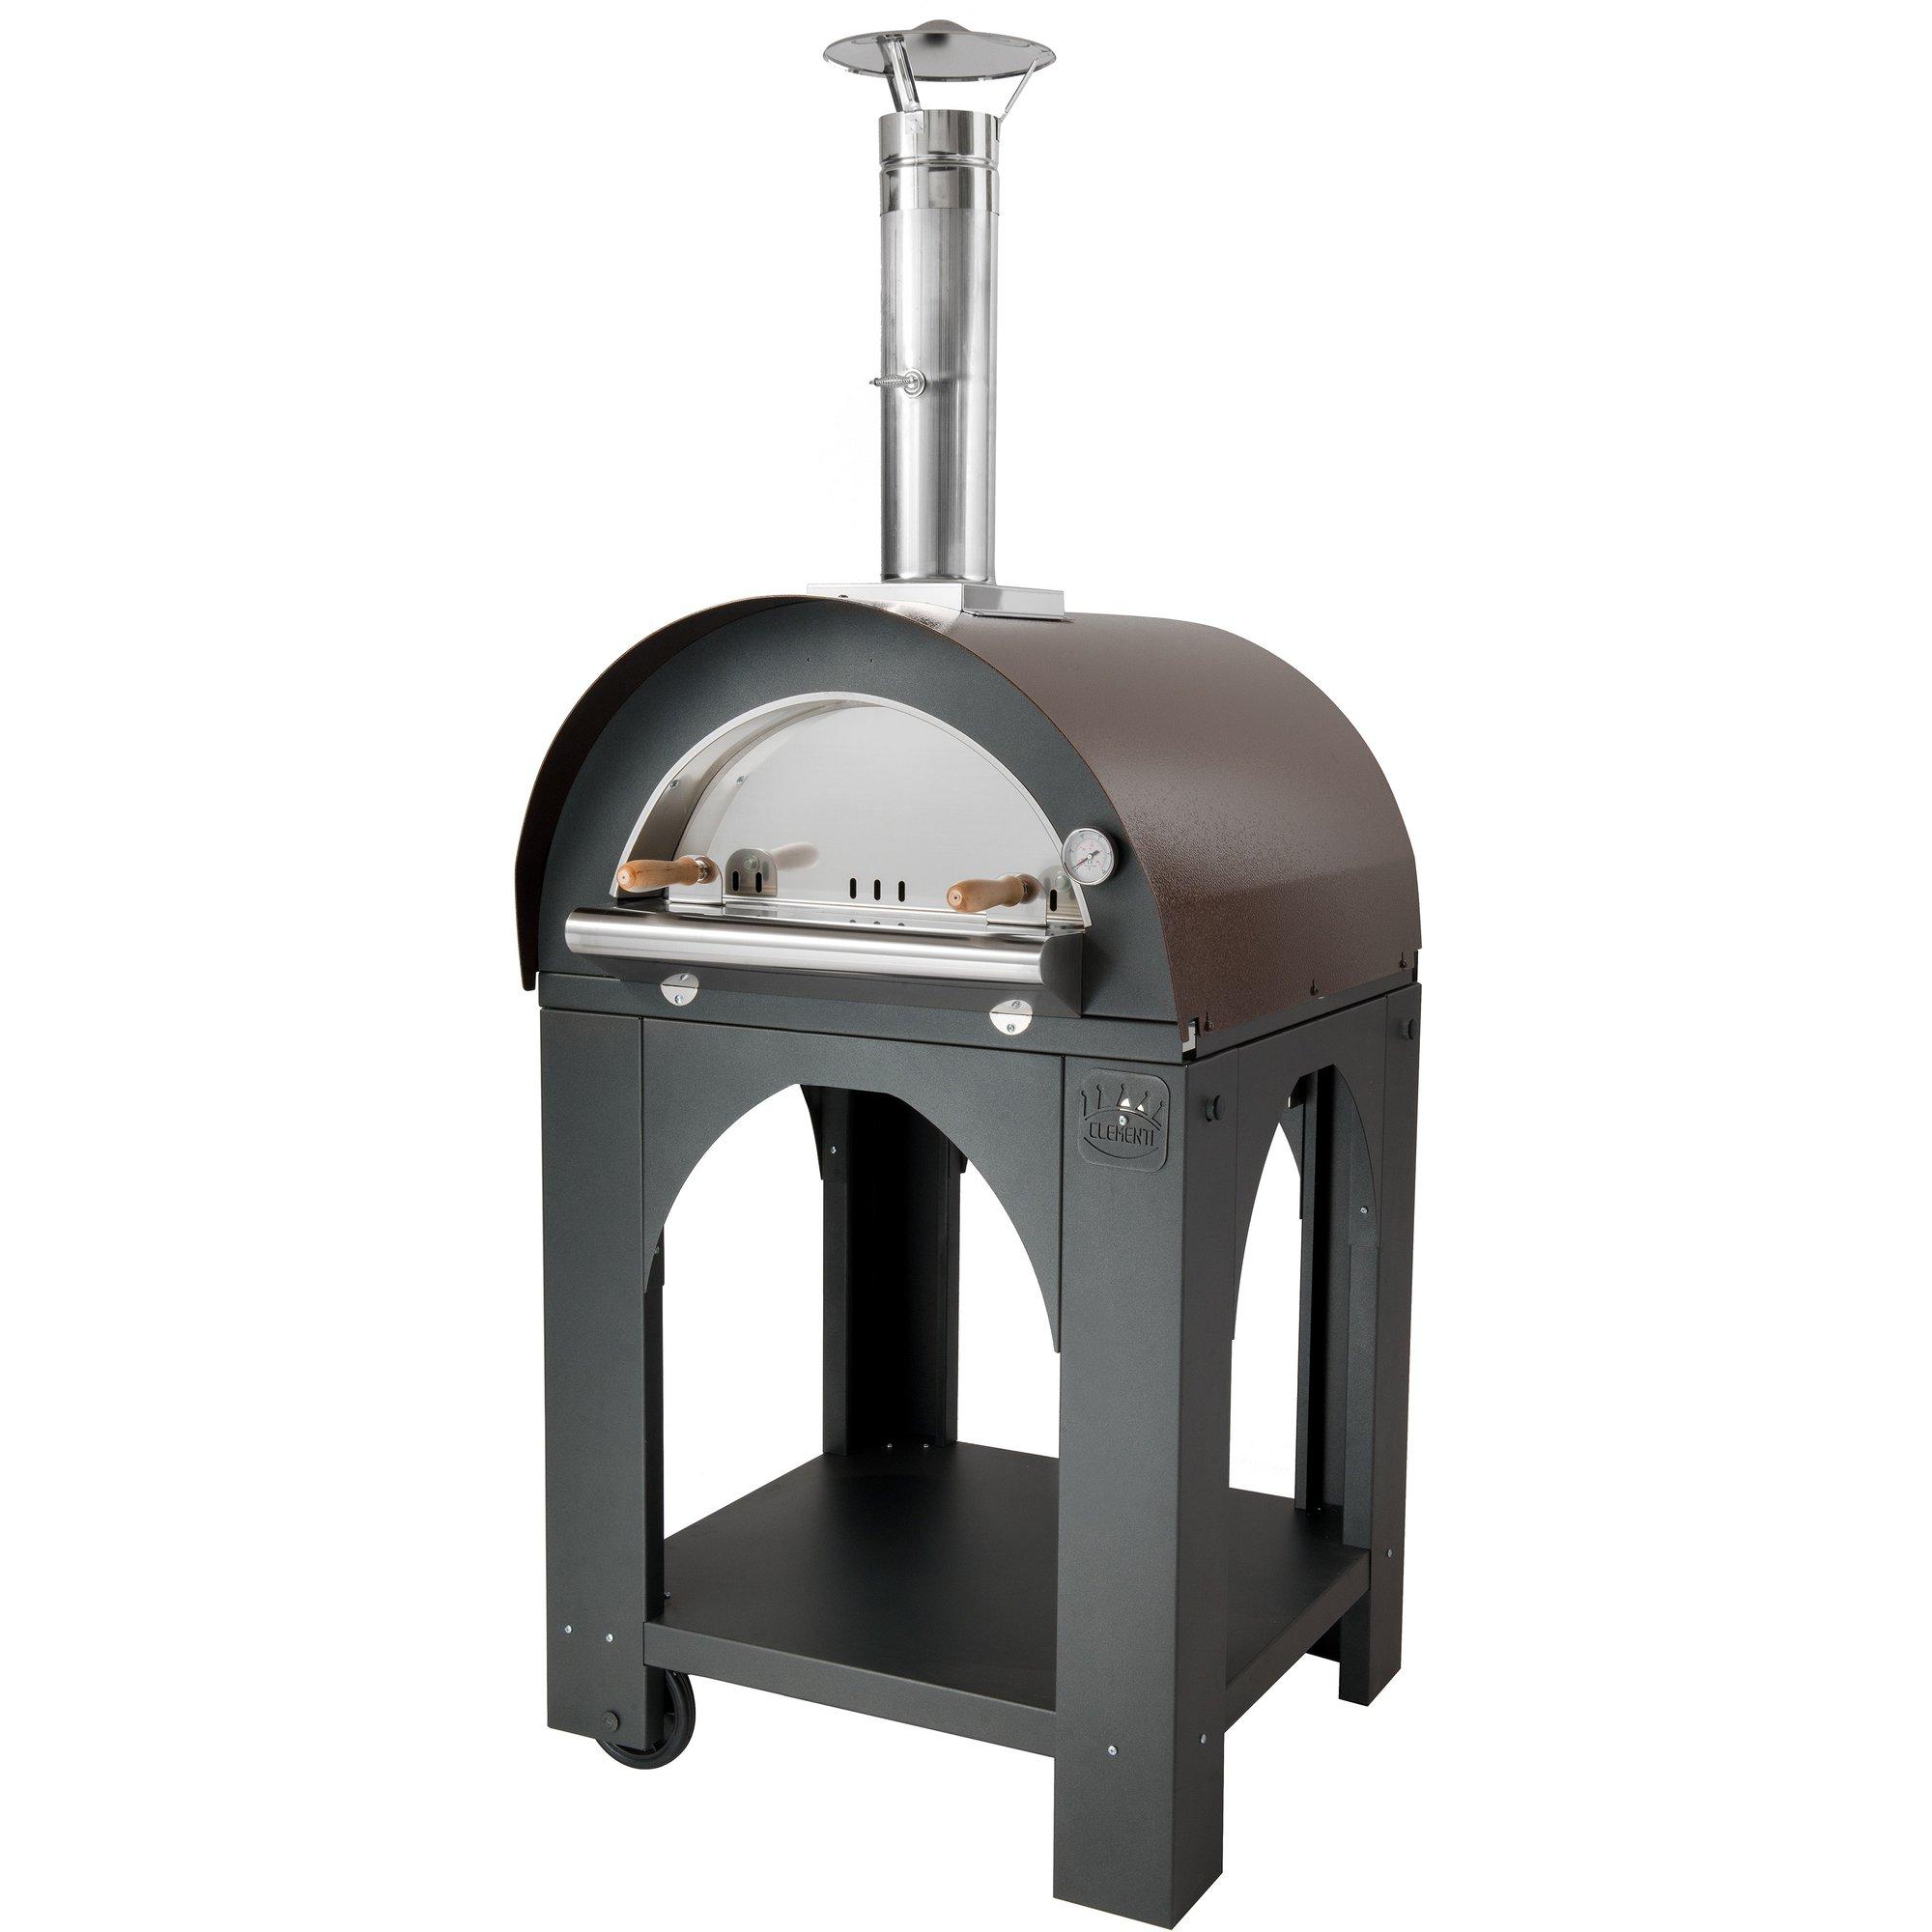 Clementi Pulcinella Vedeldad Pizzaugn 60×60 cm. Koppar